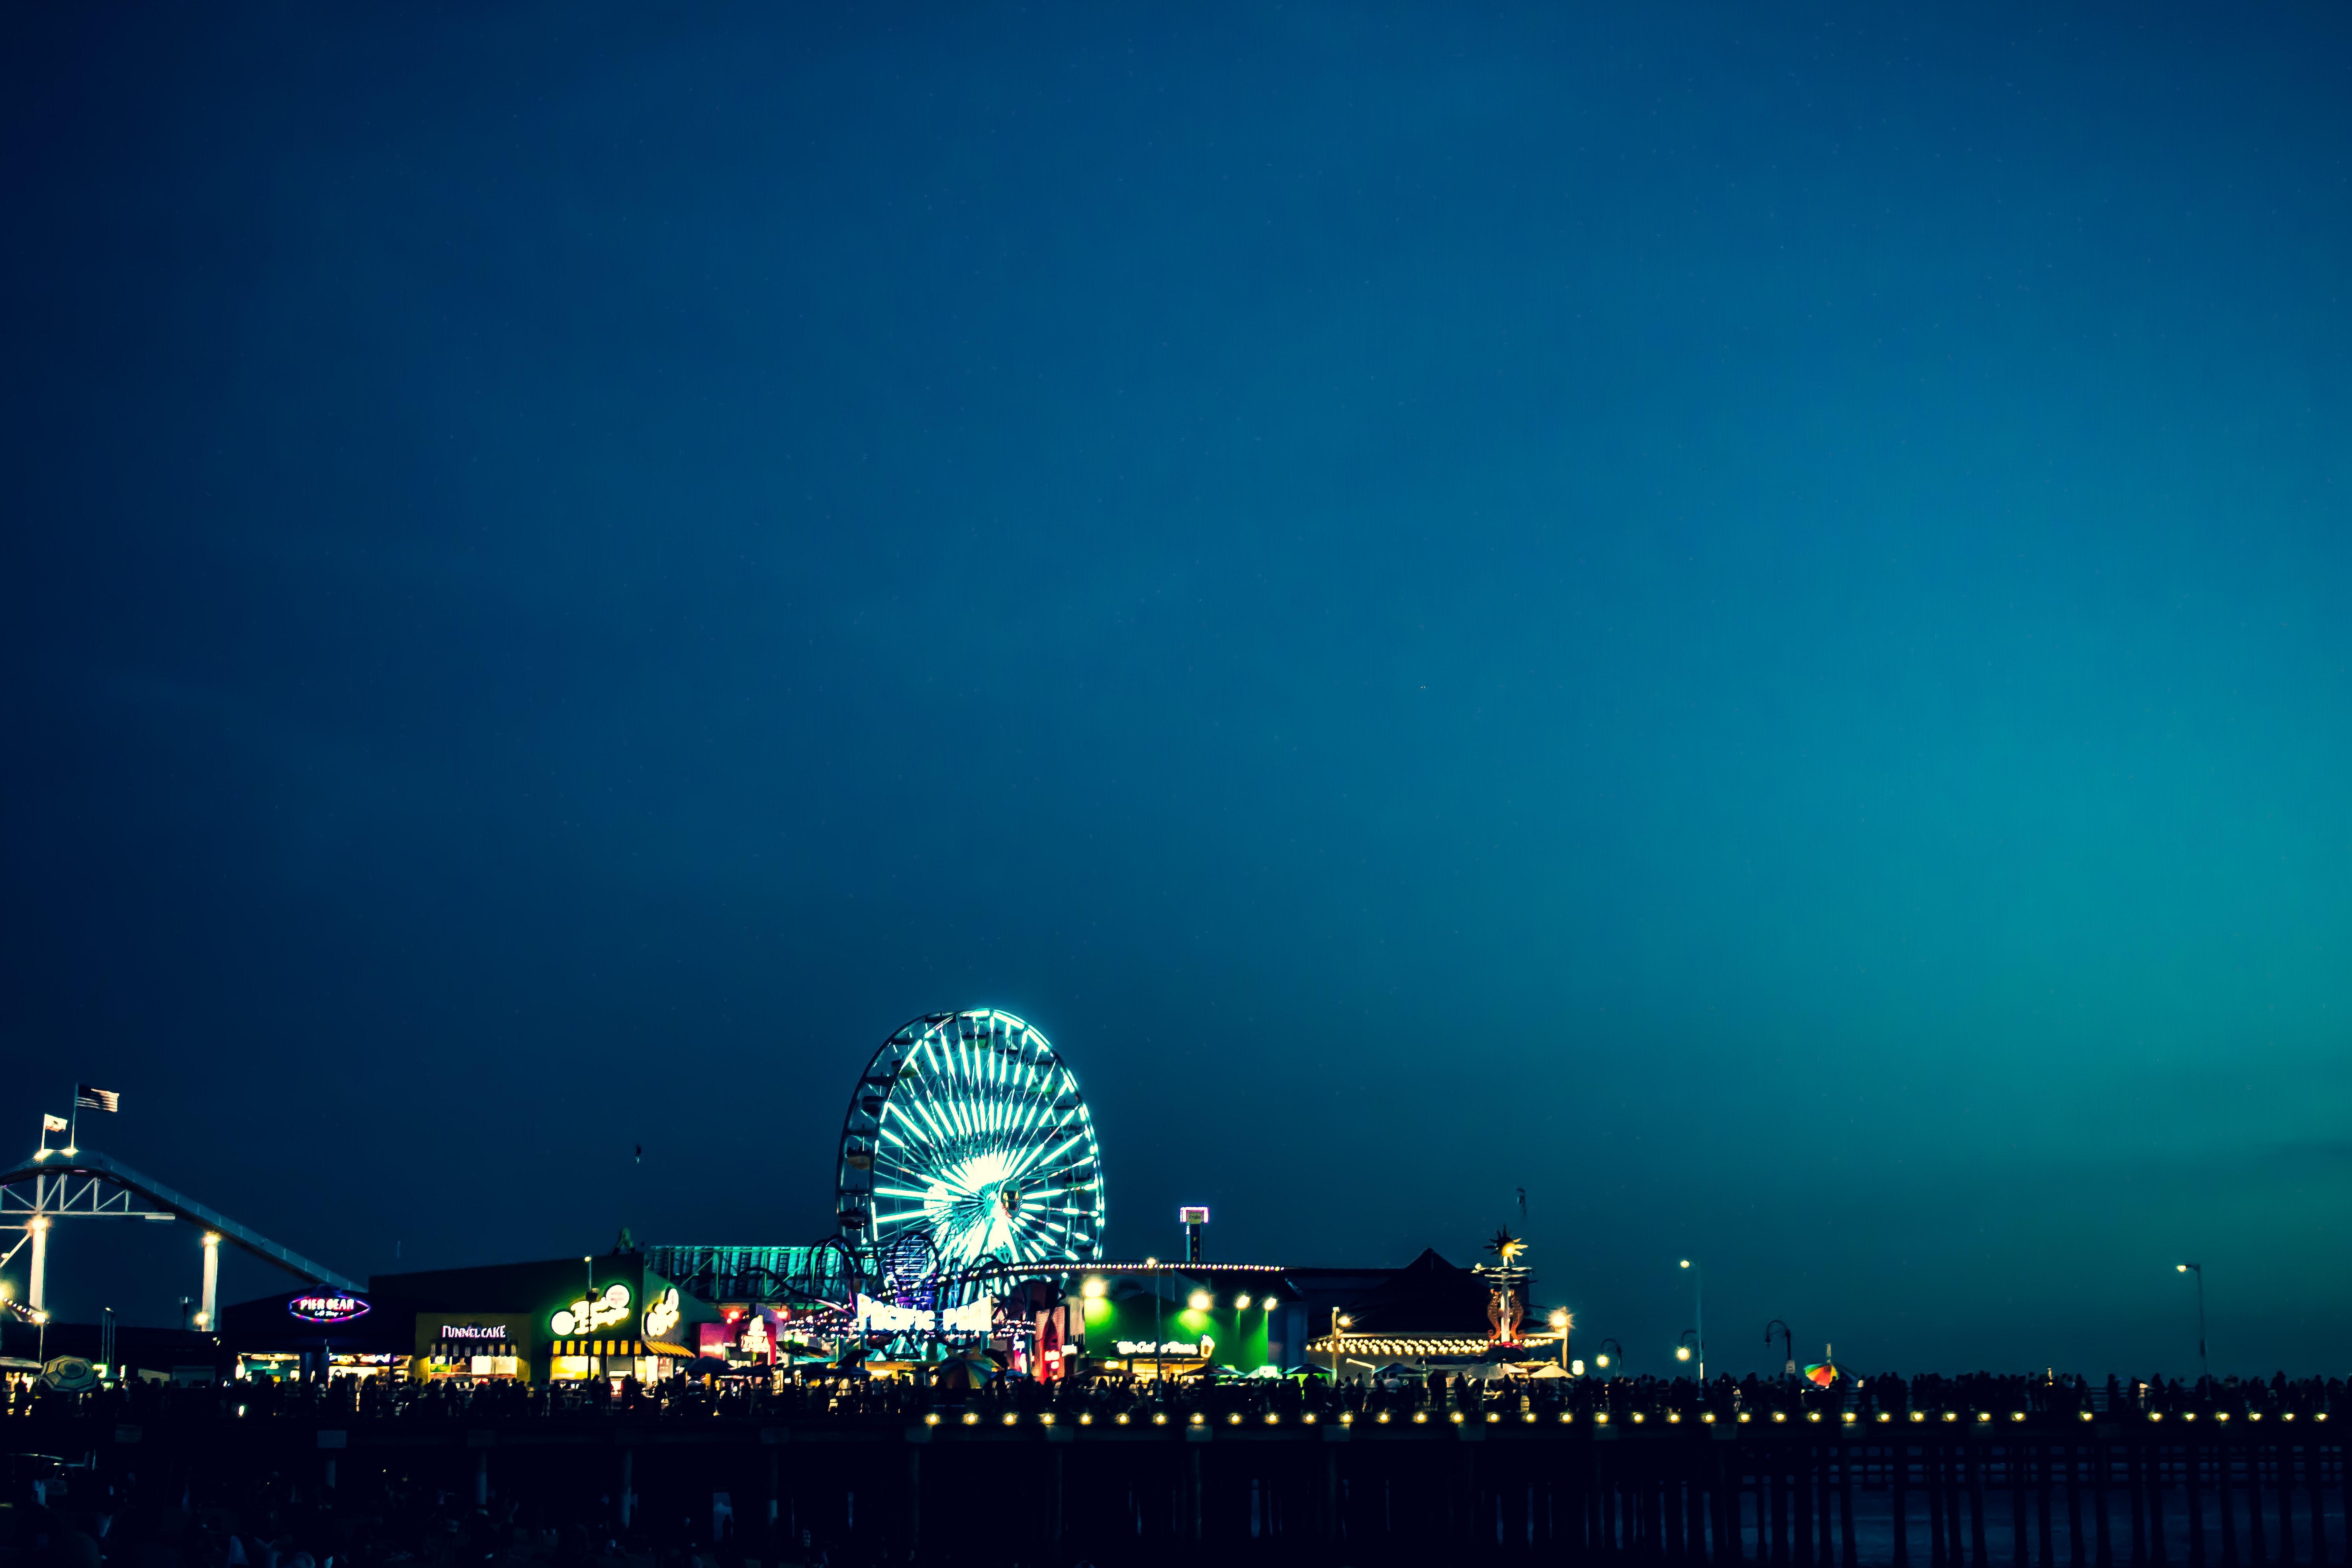 Photo of London's Eye during Nighttime, Amusement park, Illuminated, Travel, Sky, HQ Photo